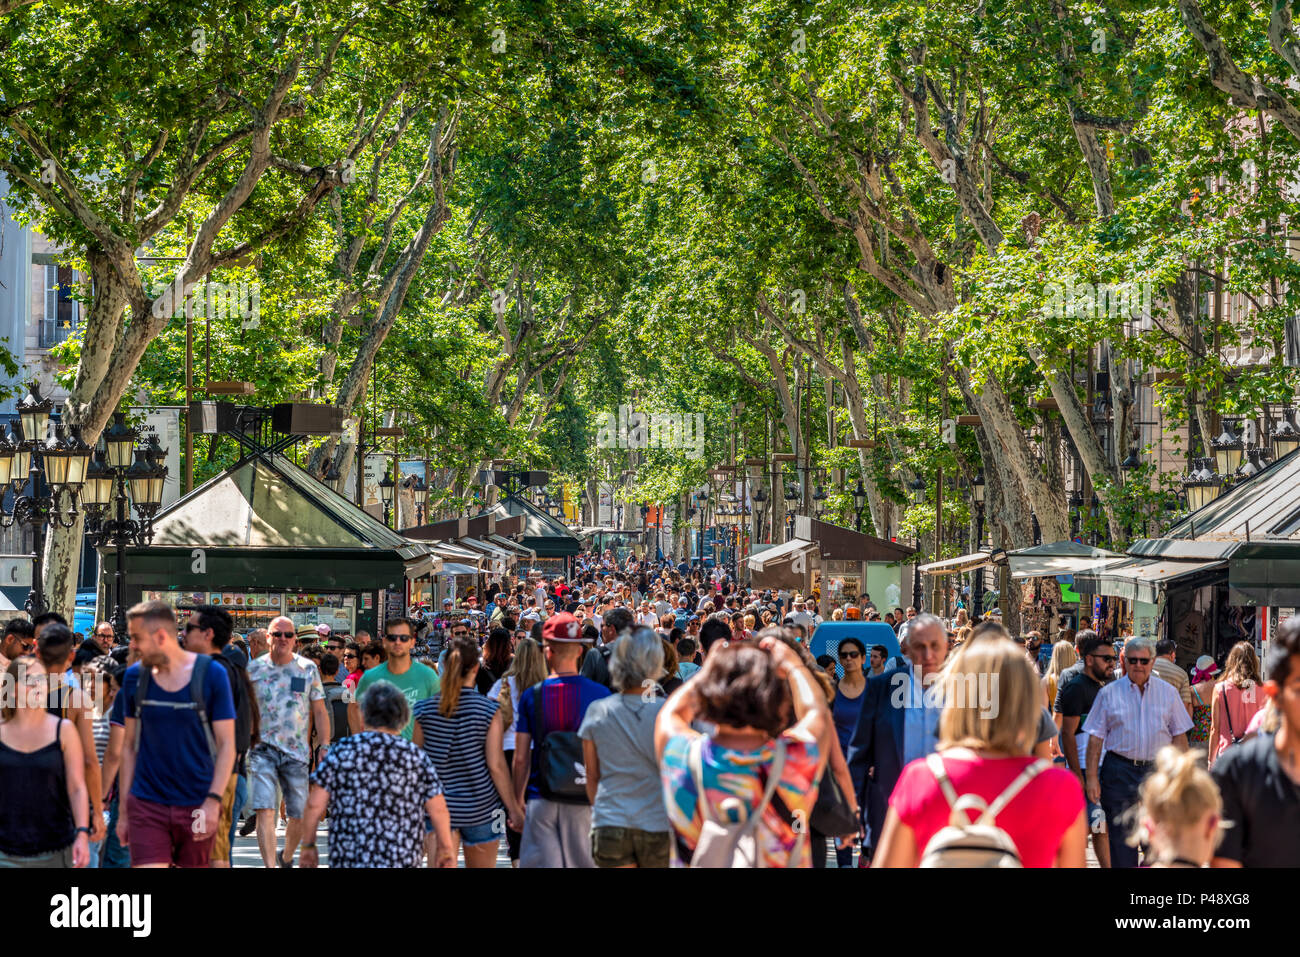 Rambla pedestrian mall, Barcelona, Catalonia, Spain - Stock Image